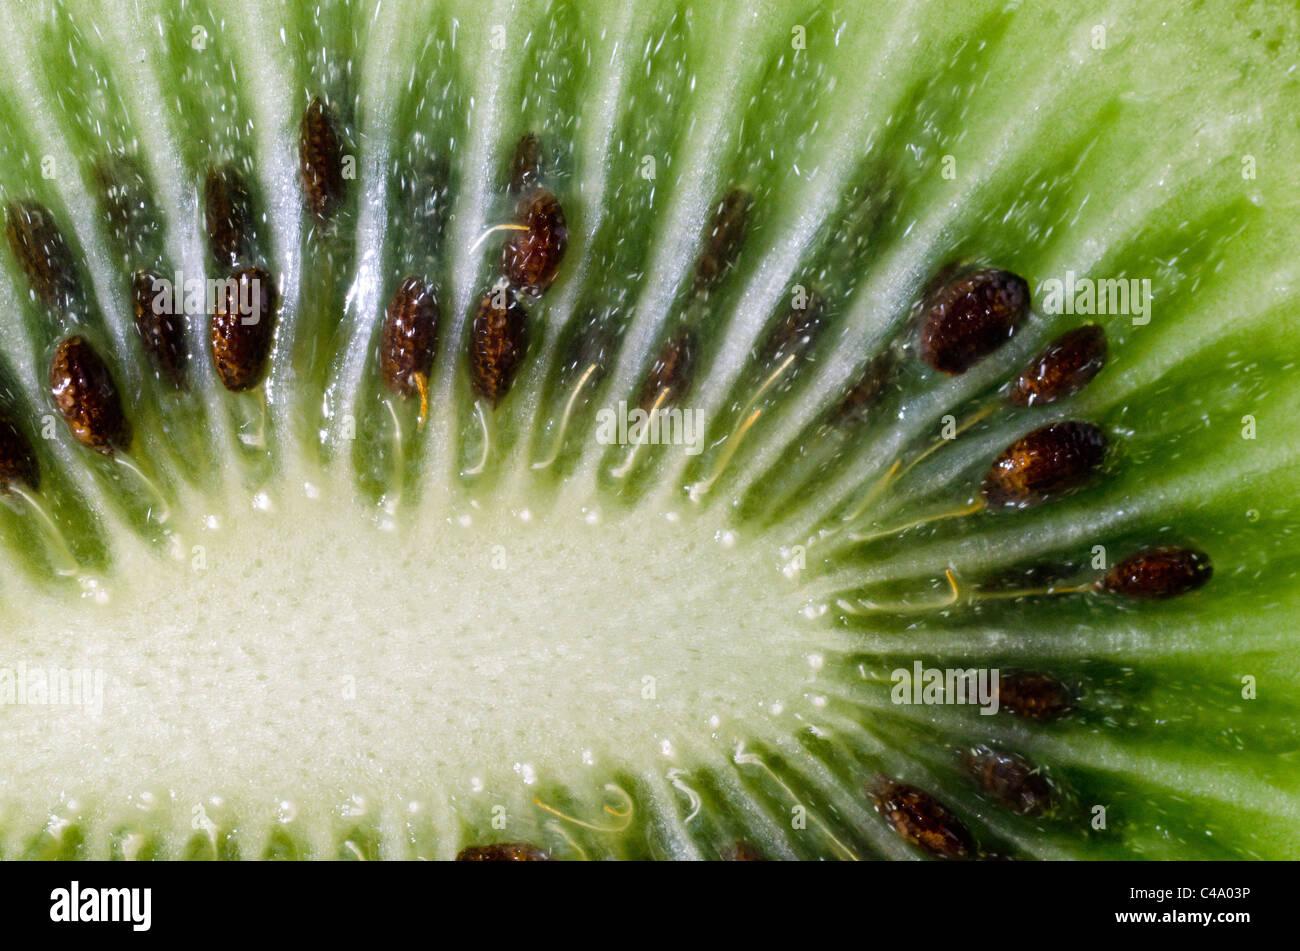 Detail of kiwi fruit - Stock Image